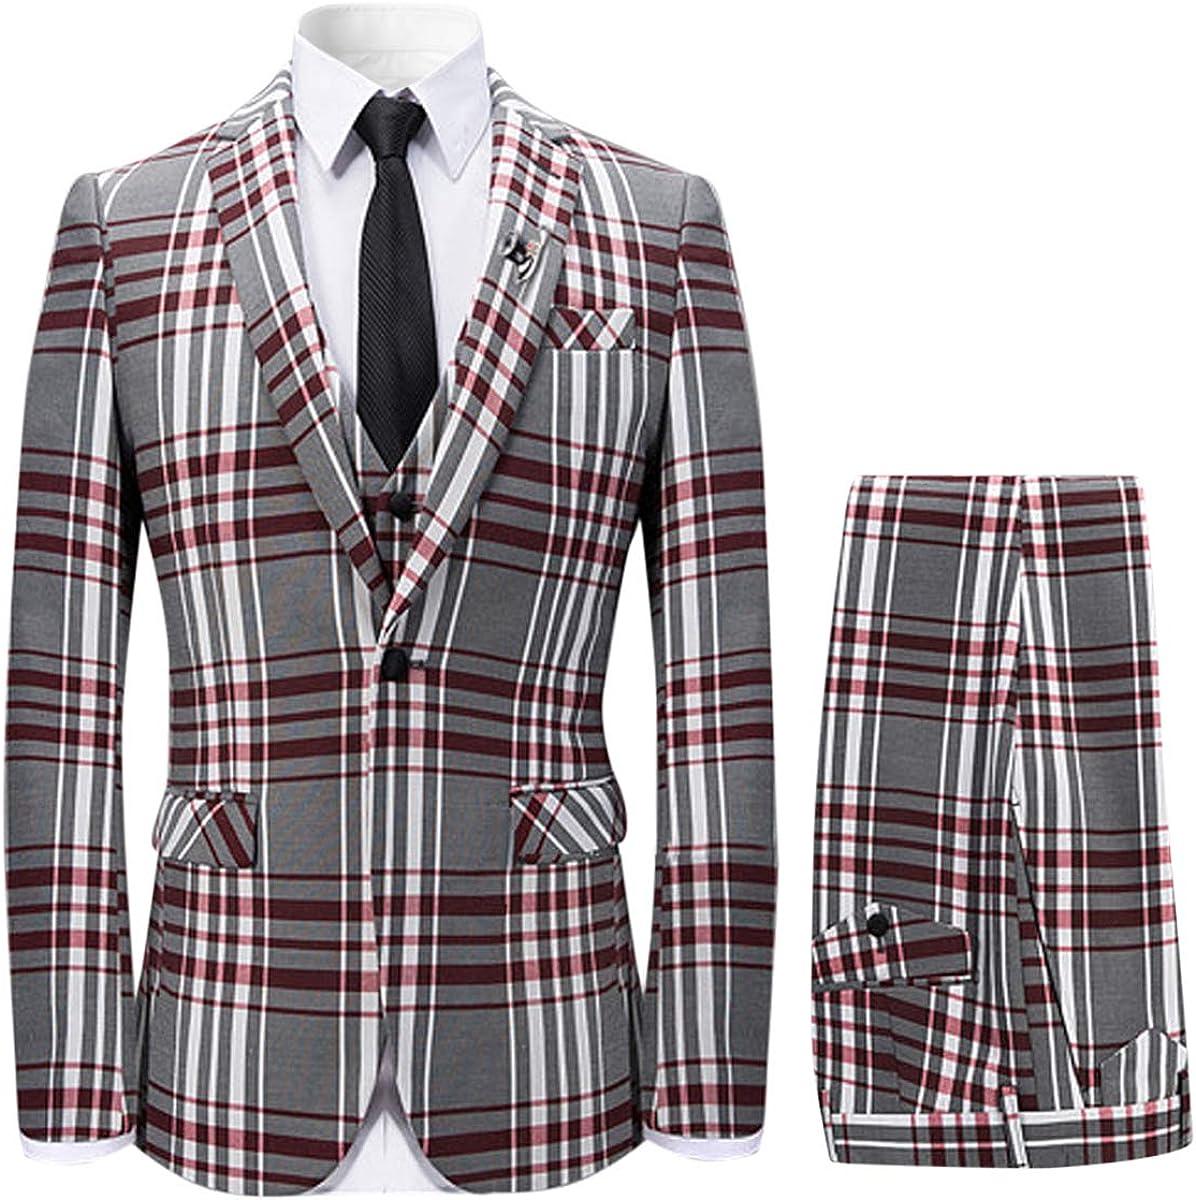 Mens 3 Piece Suit Check Max 53% OFF Plaid Slim B Store One fit Formal Button Dress